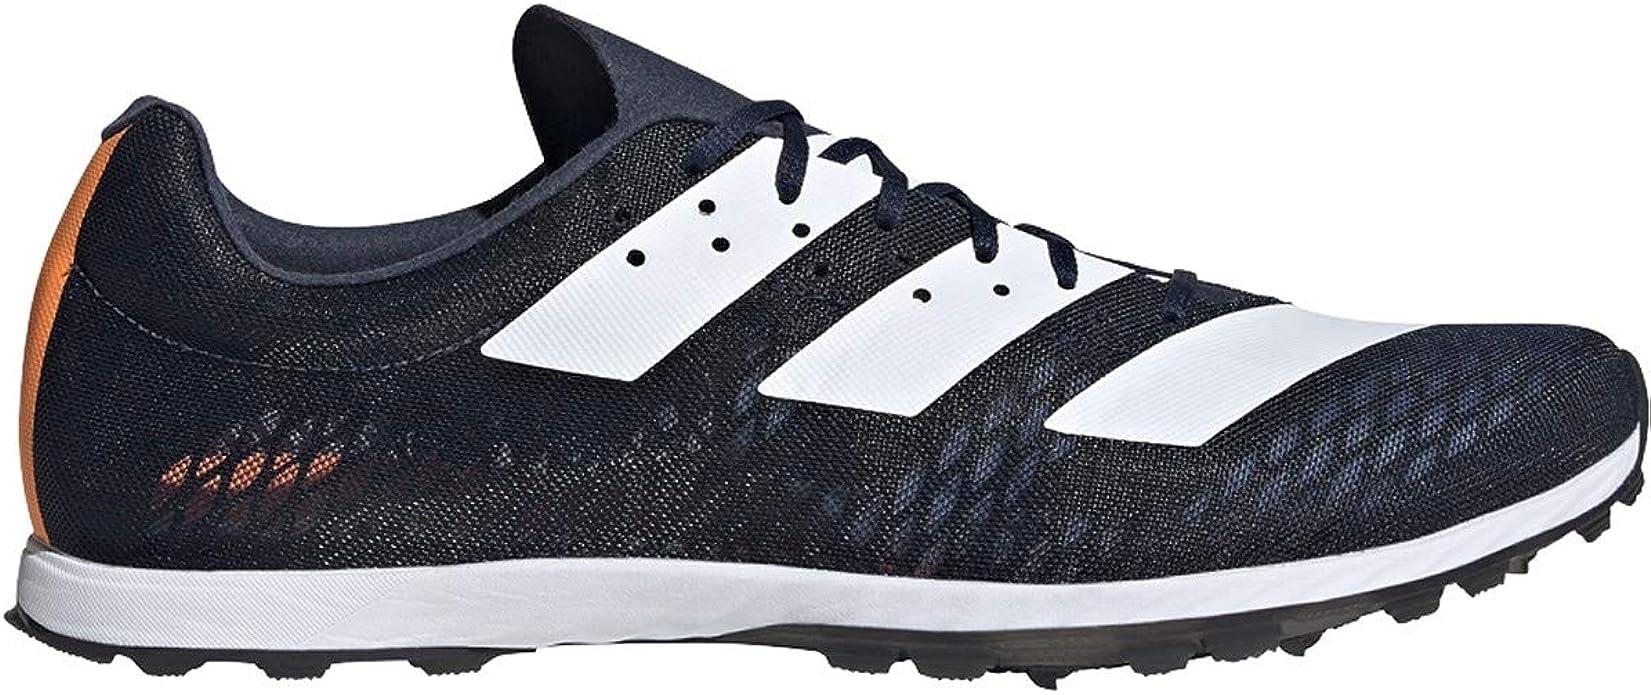 Amazon.com | adidas Adizero XC Sprint Shoe - Men's Track & Field ...